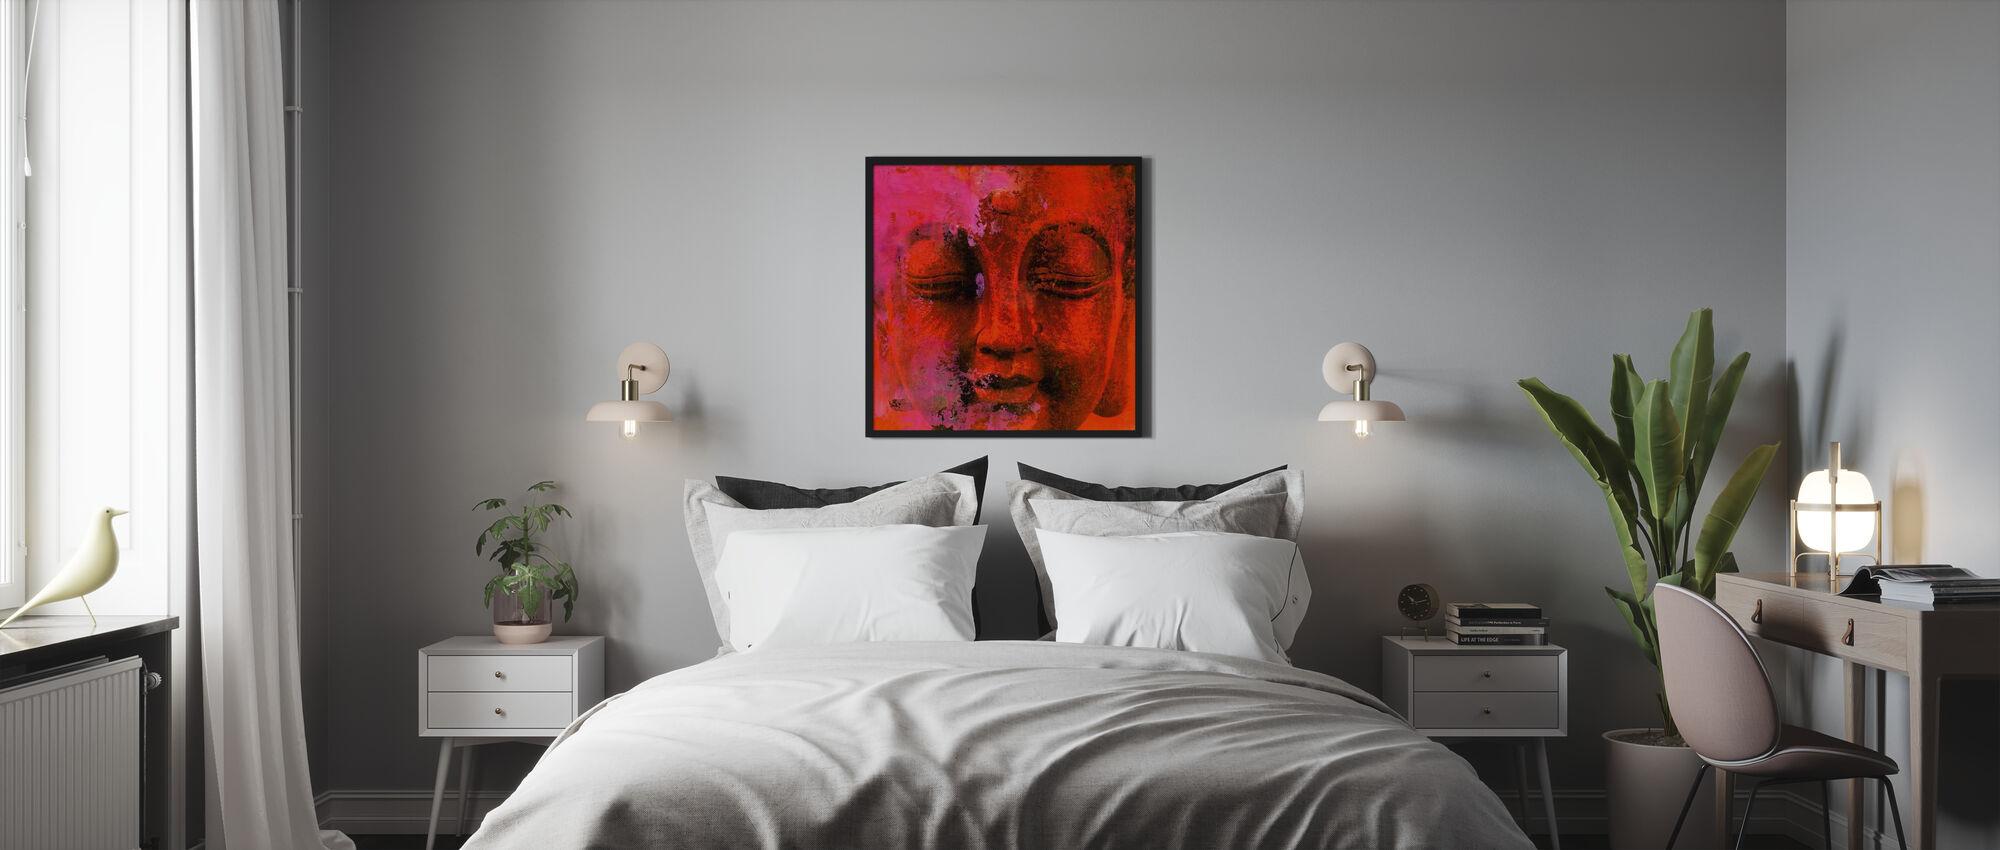 Röd Buddha - Inramad tavla - Sovrum